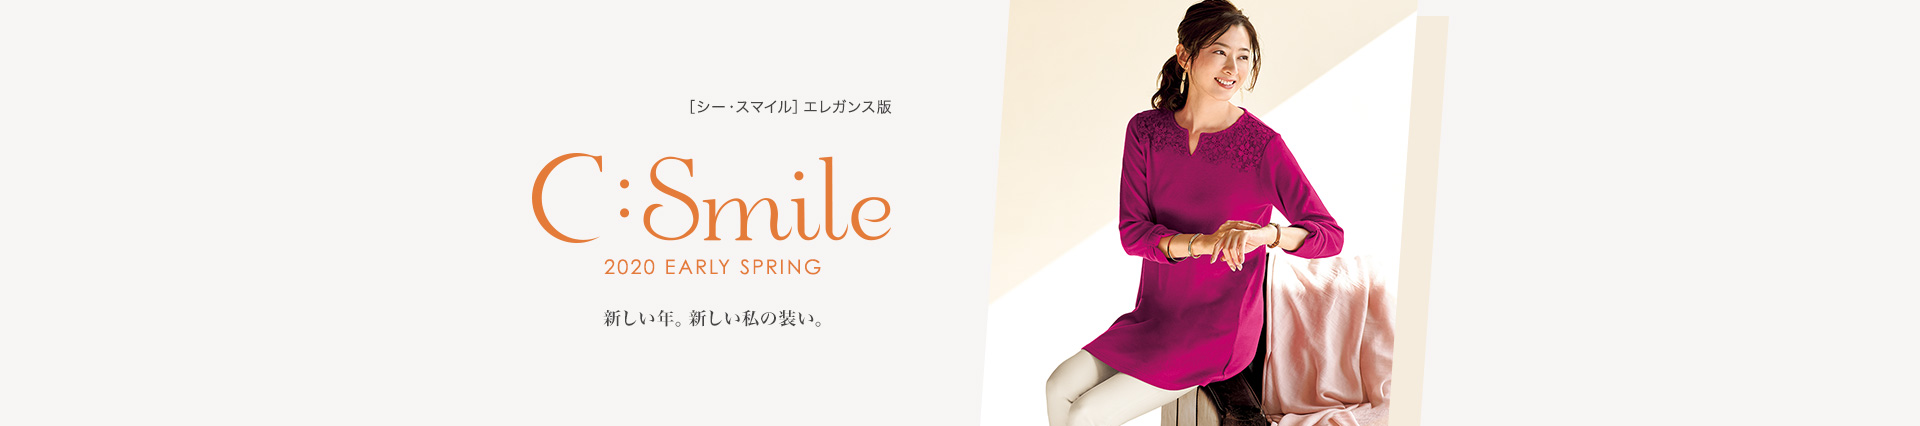 C:Smile(シー・スマイル)エレガンス版アイテム